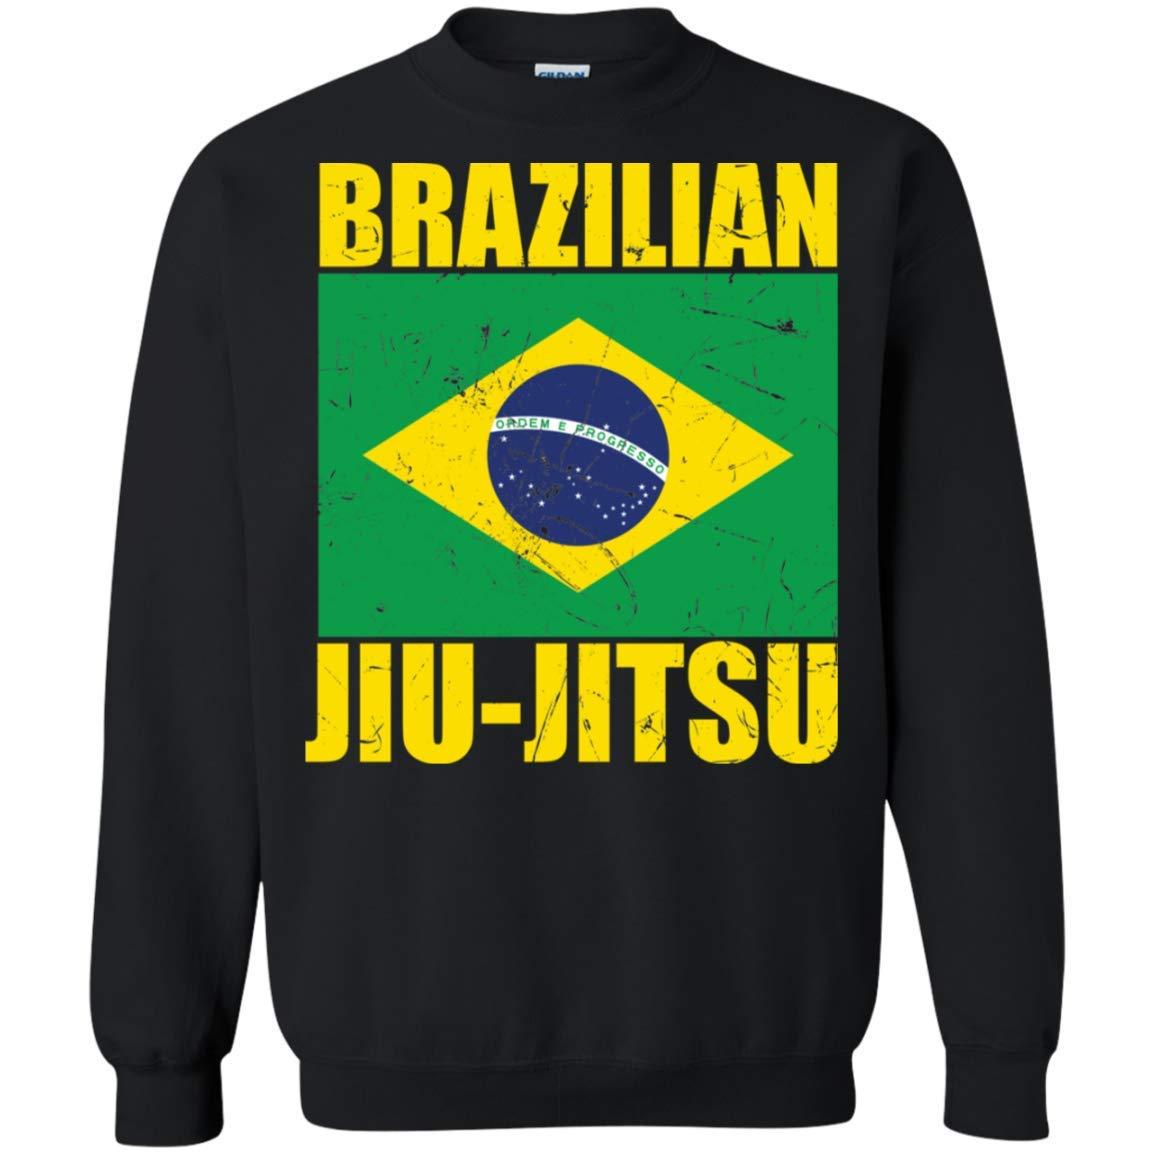 Superhero Gear Brazilian Jiu Jitsu Flag BJJ Crewneck Pullover Sweatshirt 8 oz.